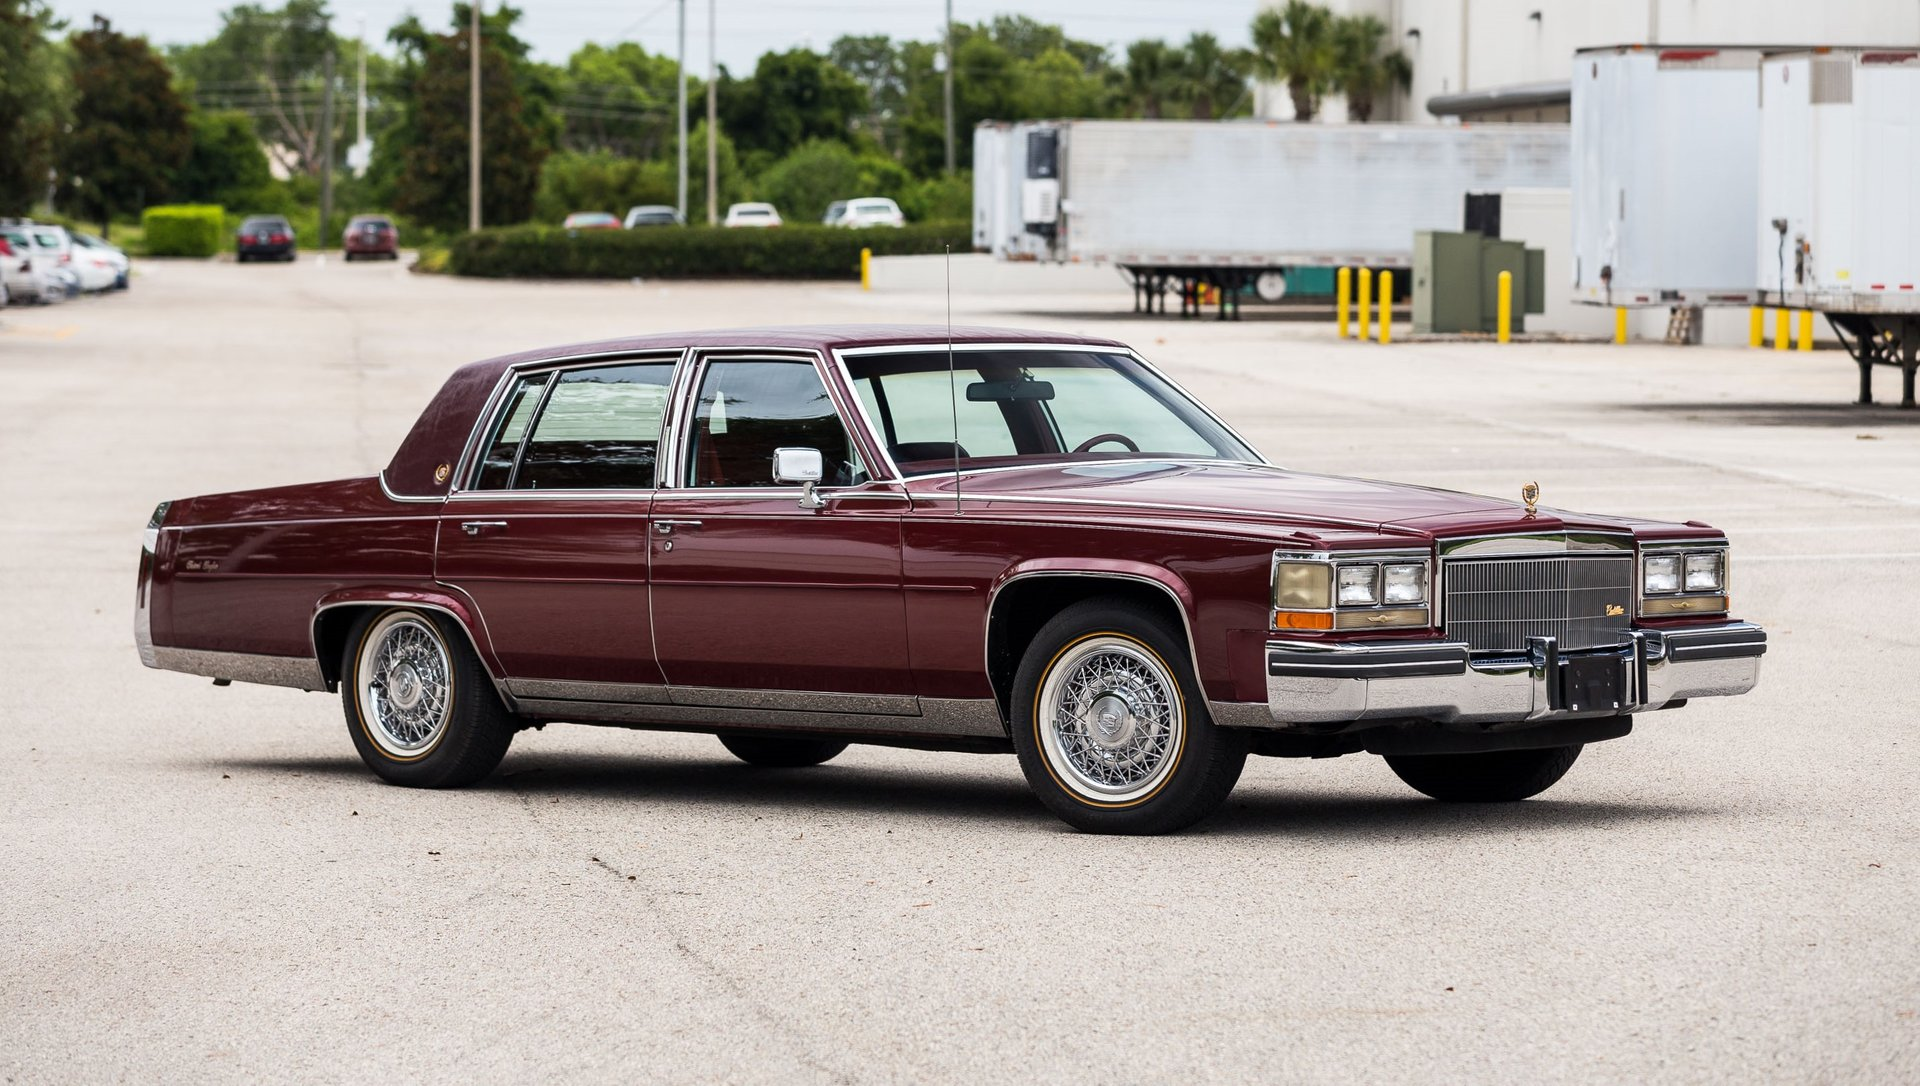 1985 Cadillac Fleetwood Brougham